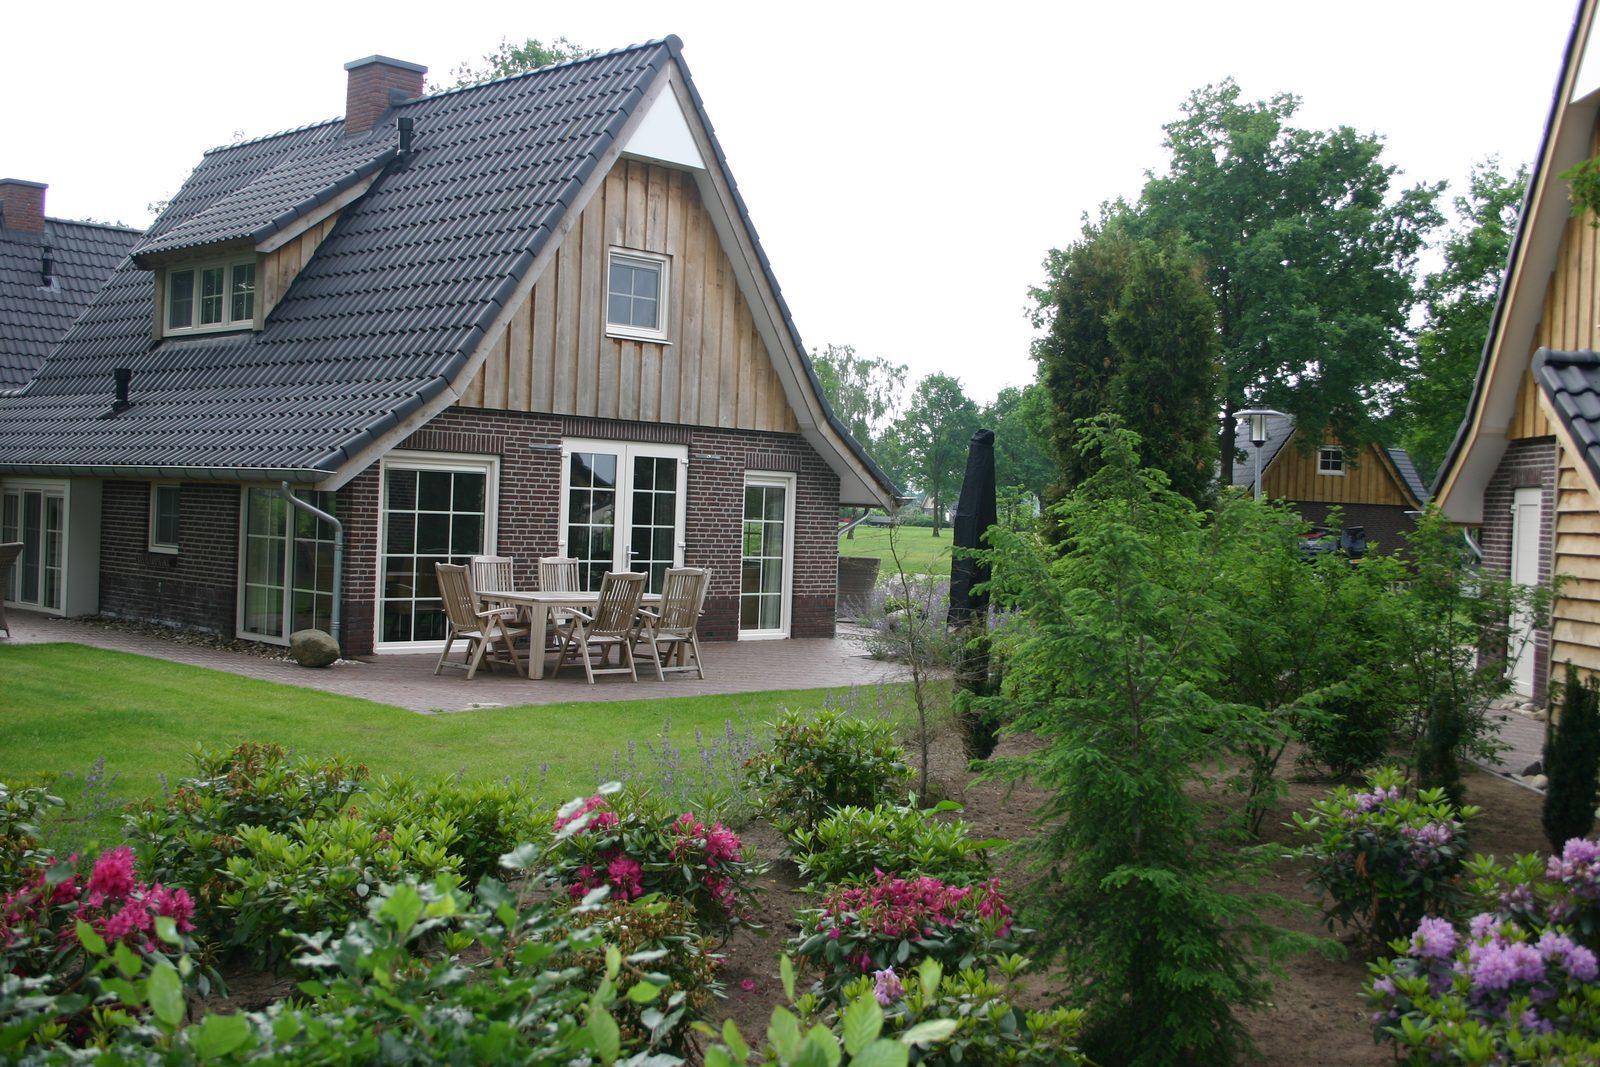 Bouwstijl en tuin